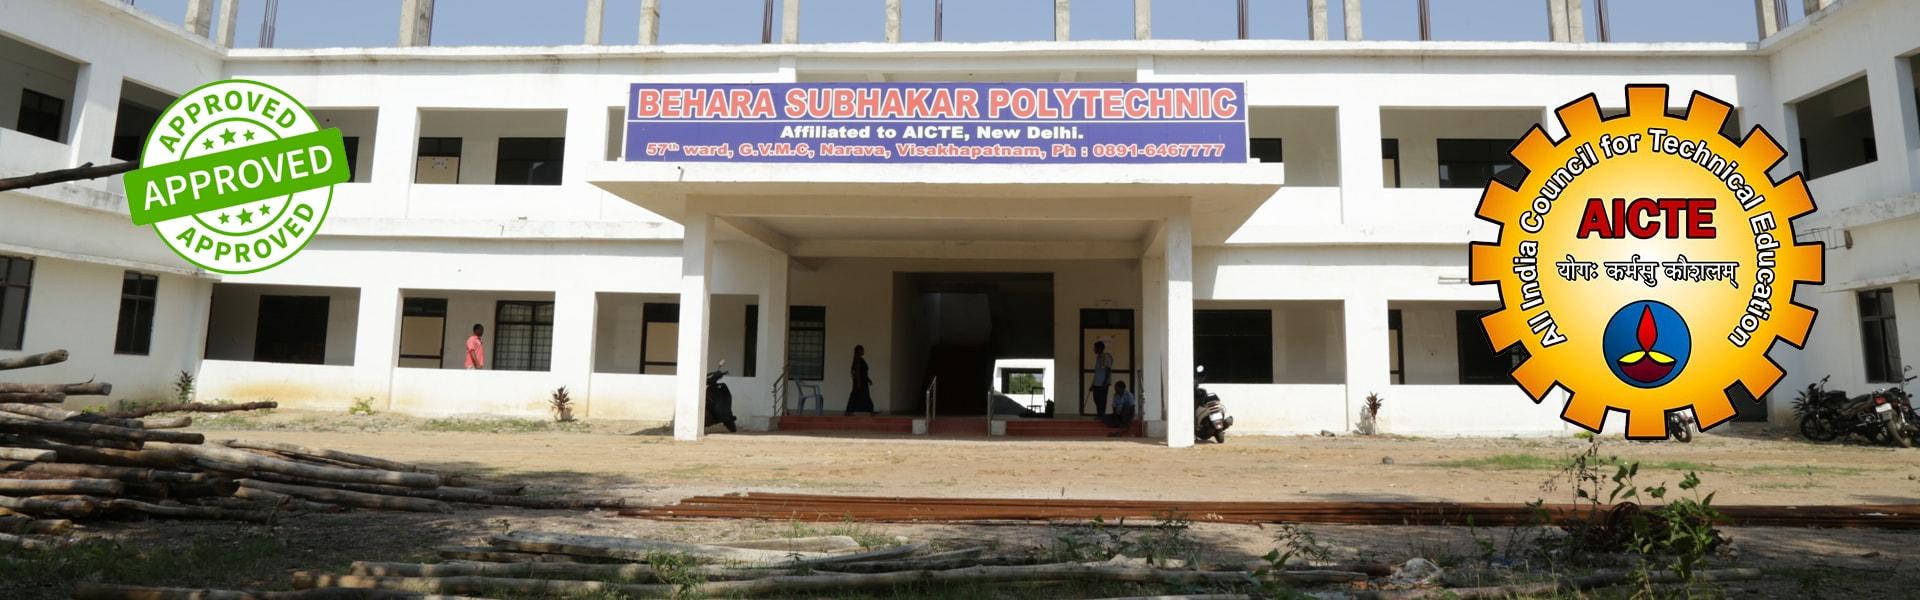 BEHARA SUBHAKAR POLYTECHNIC